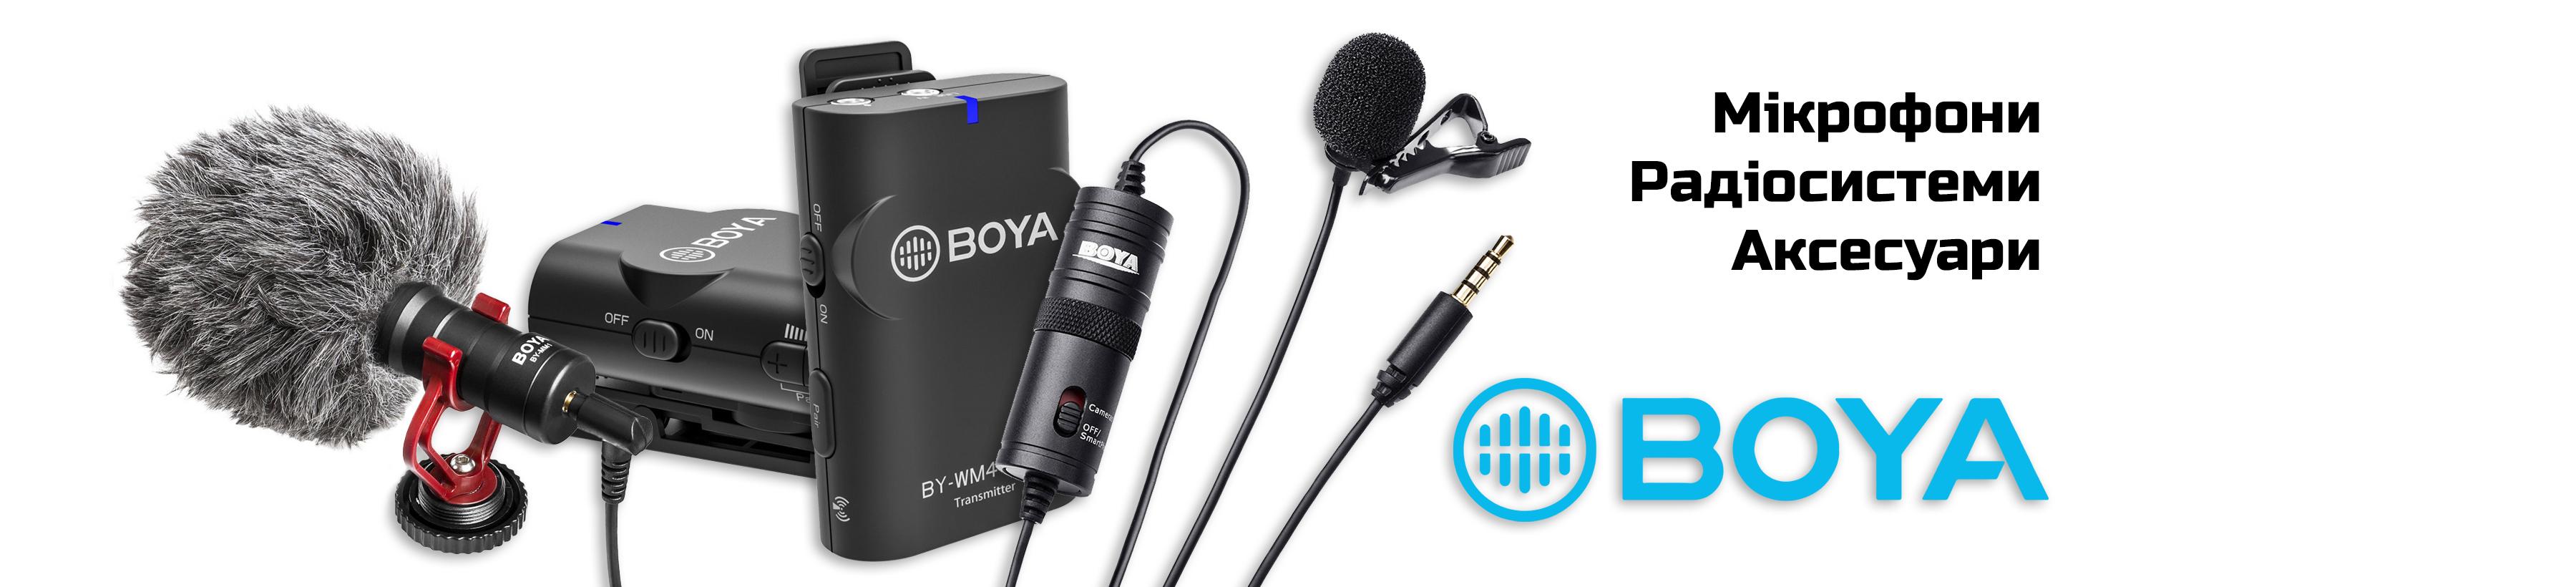 Boya: мікрофони, радіосистеми та аксесуари